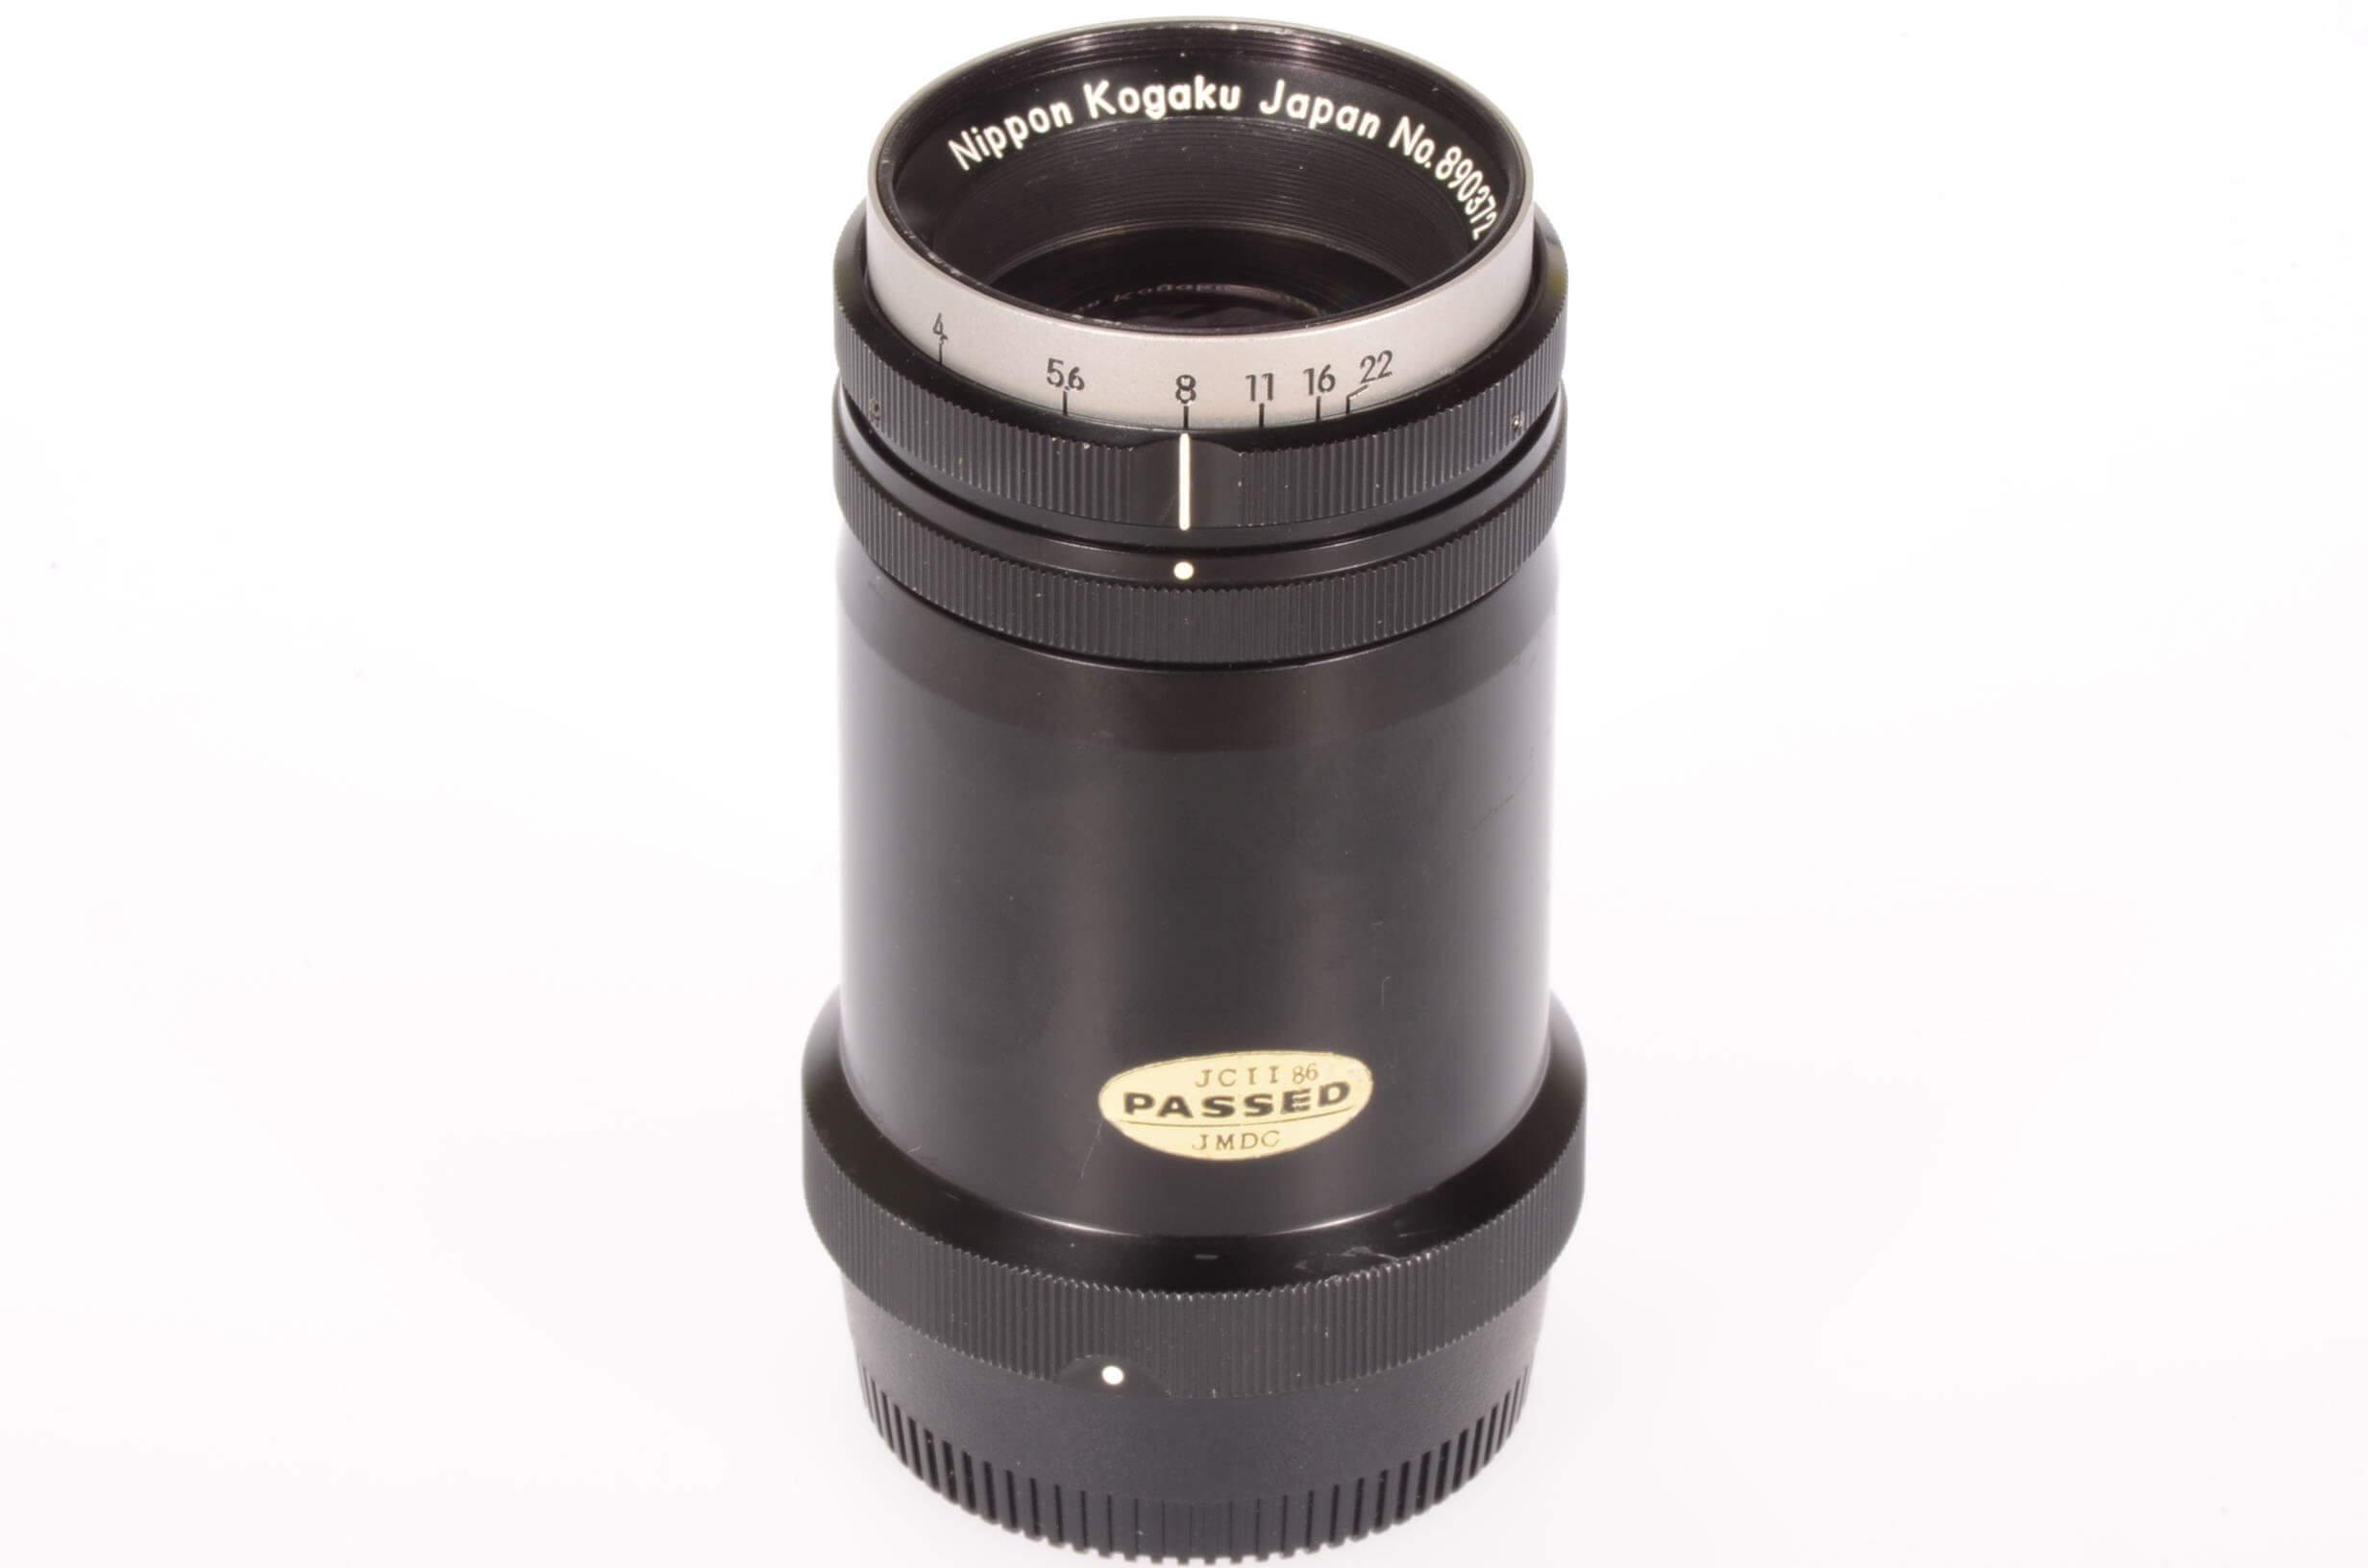 Nikon 135mm f4 Nikkor bellows lens, long mount, rare, excellent condition!